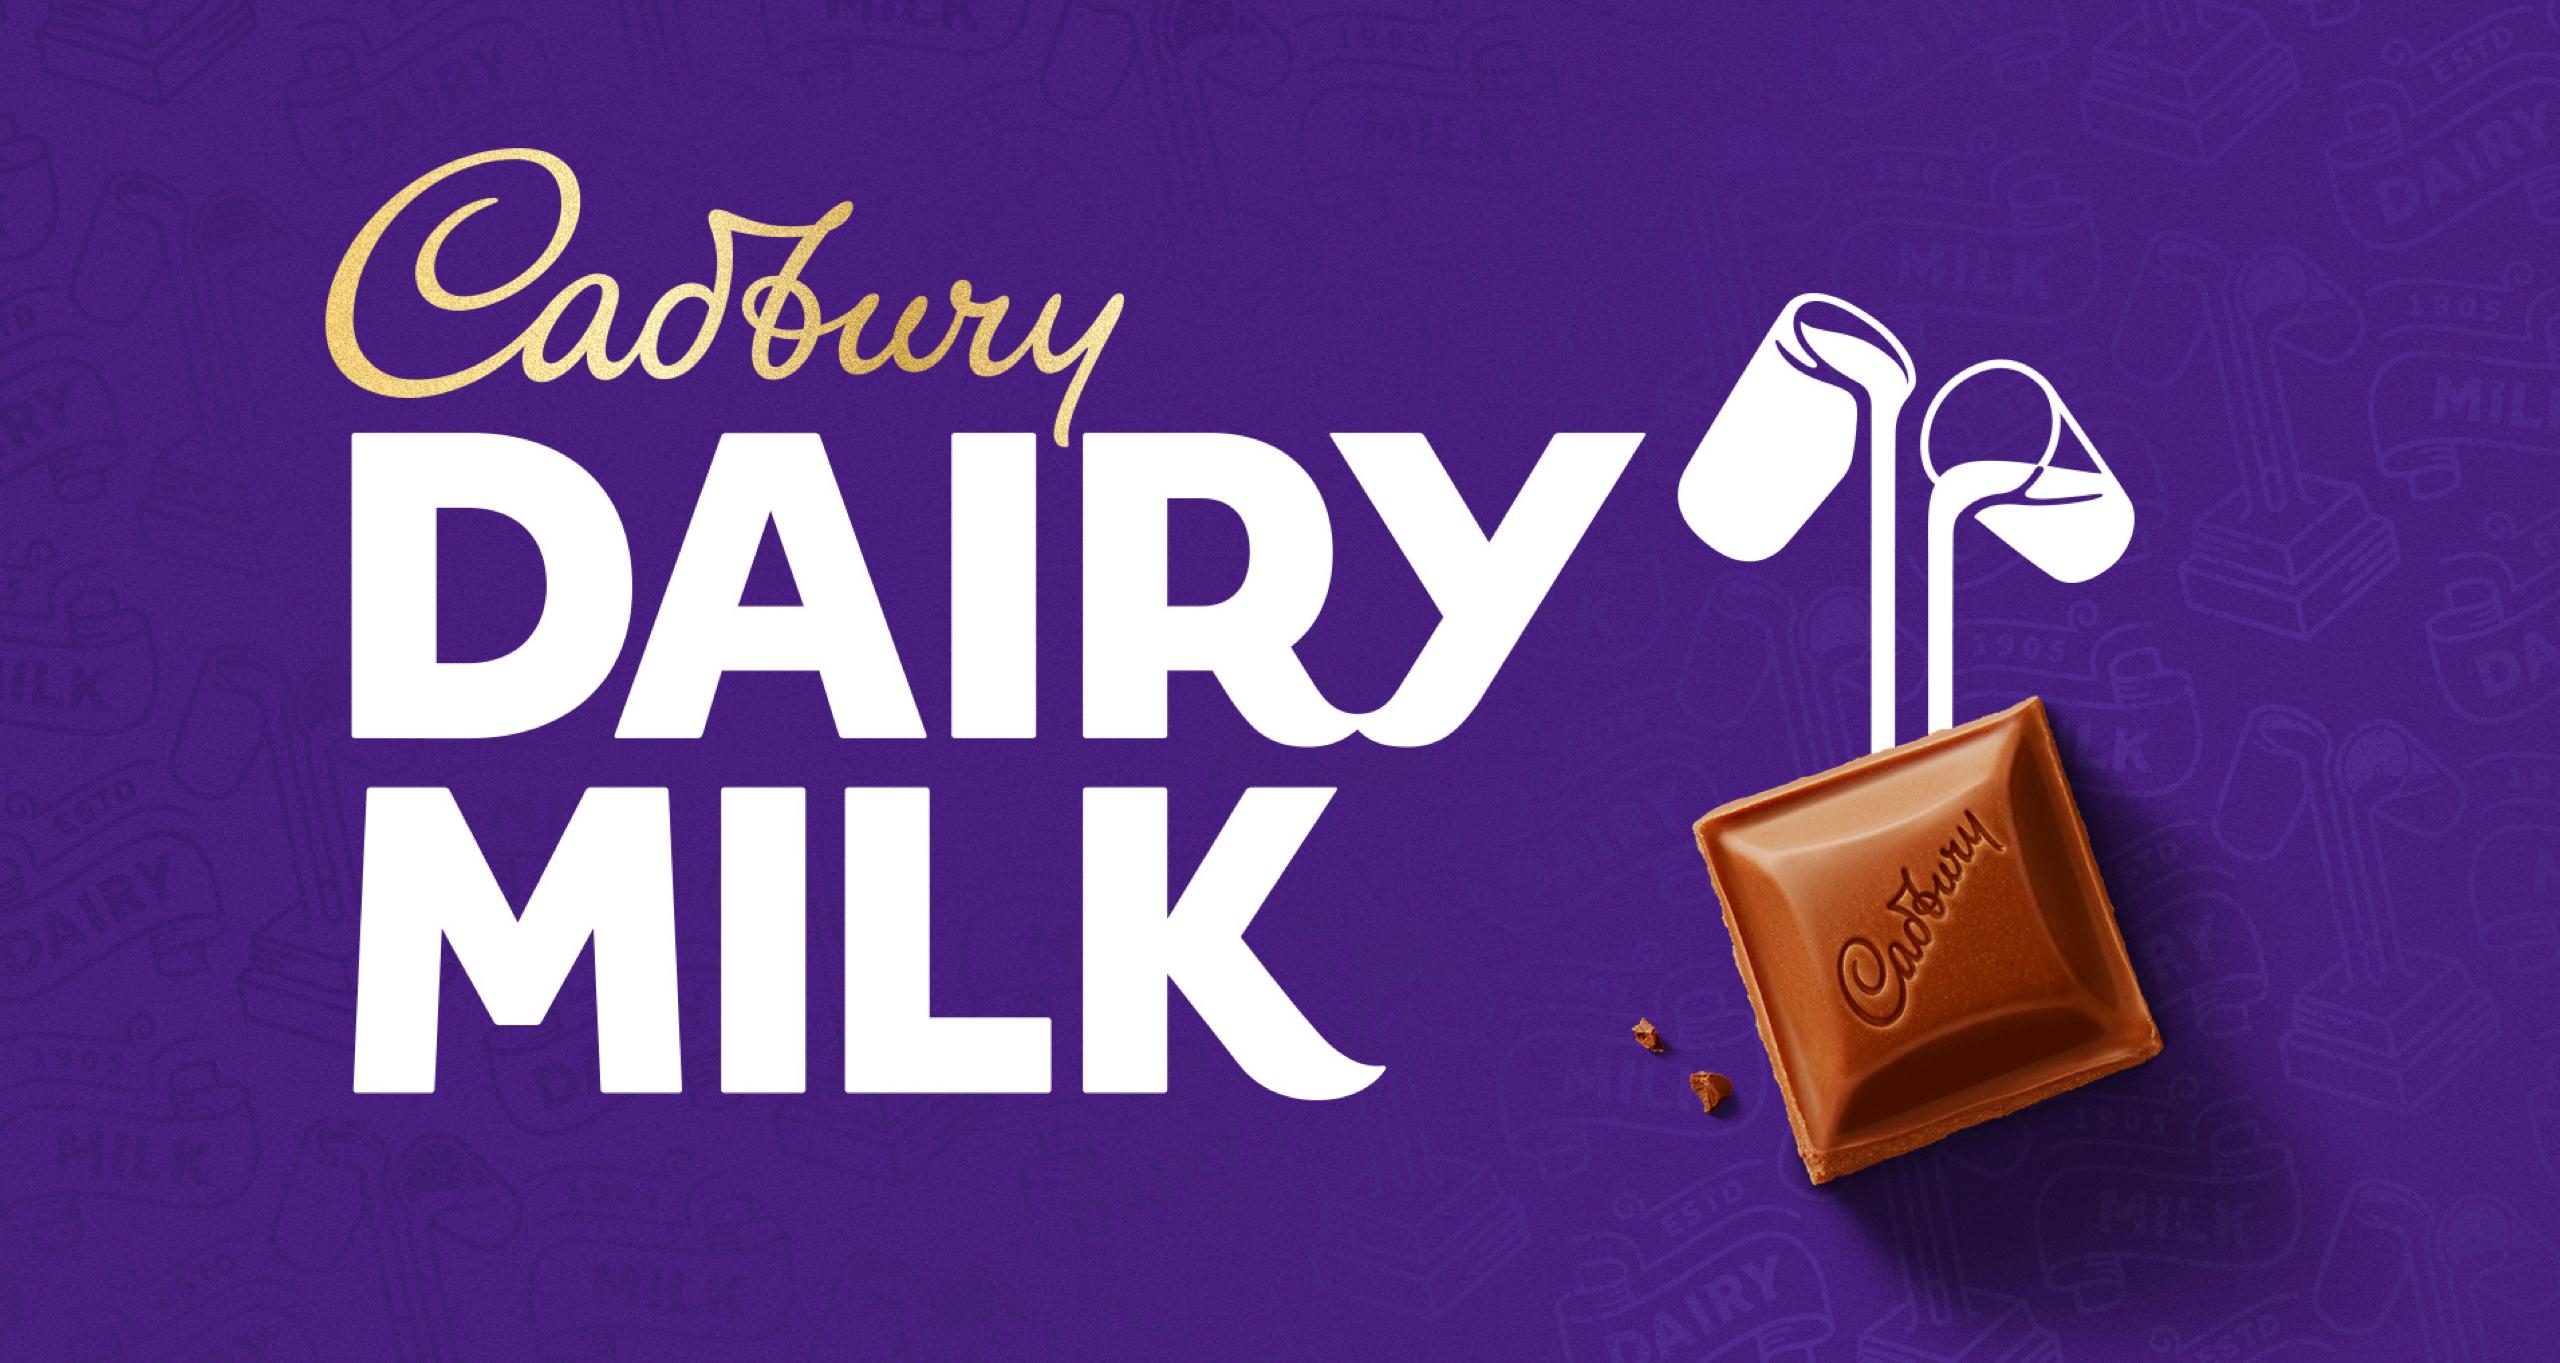 eat marketing - tasty round up april 2020 - Dairy Milk